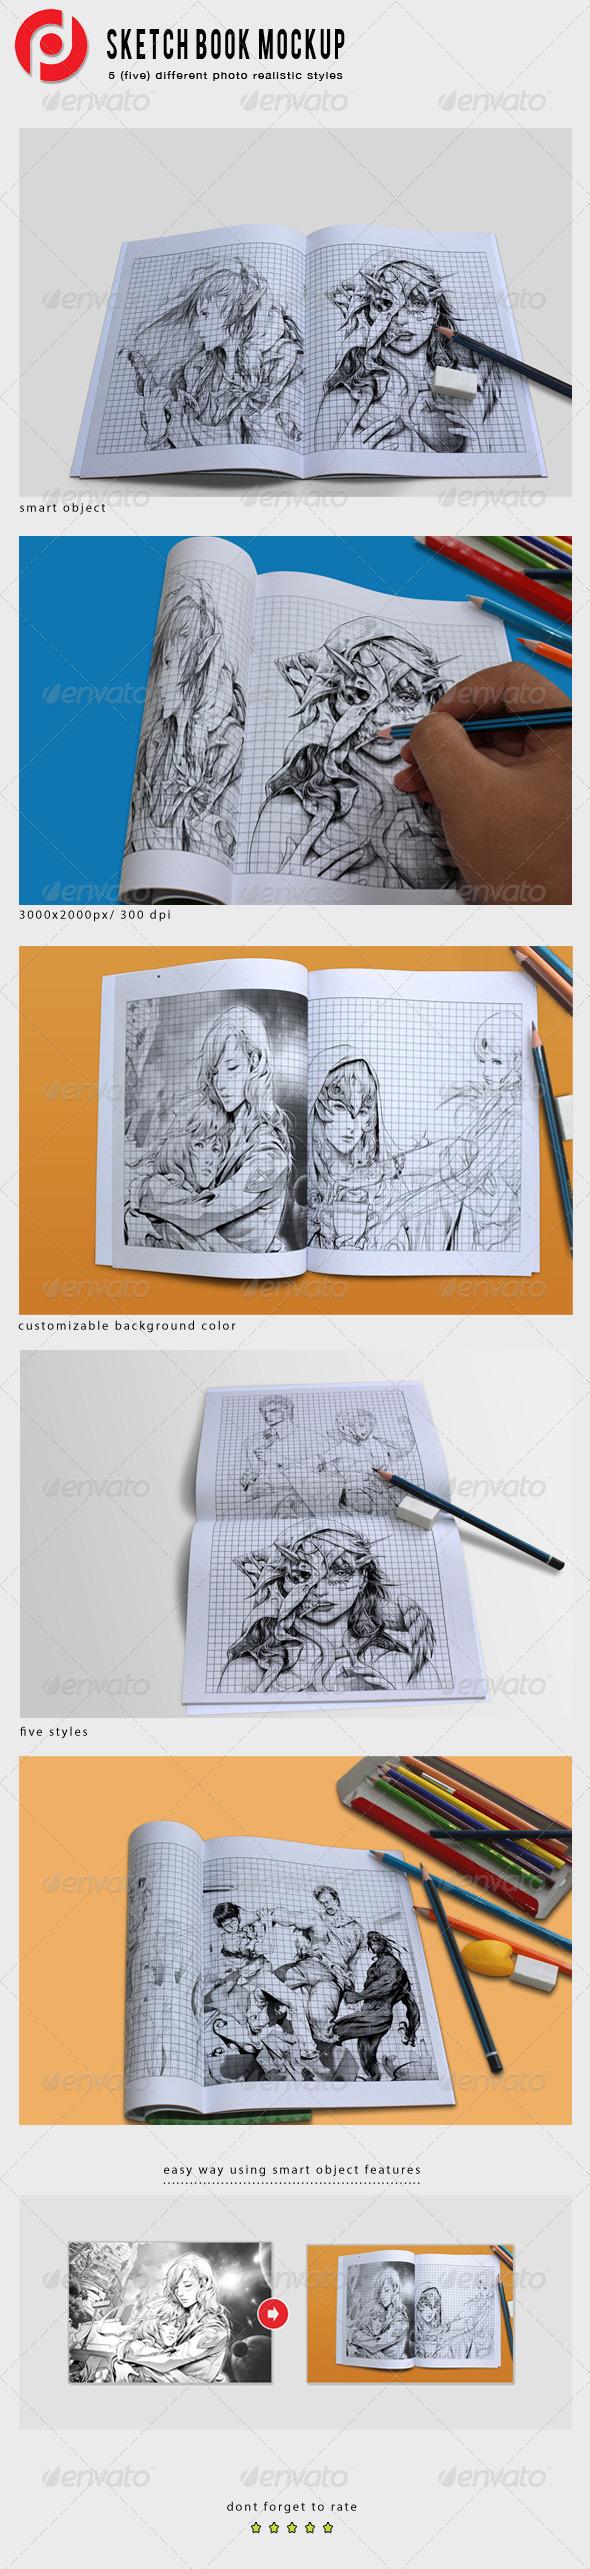 GraphicRiver Sketch Book Mockups 6429443